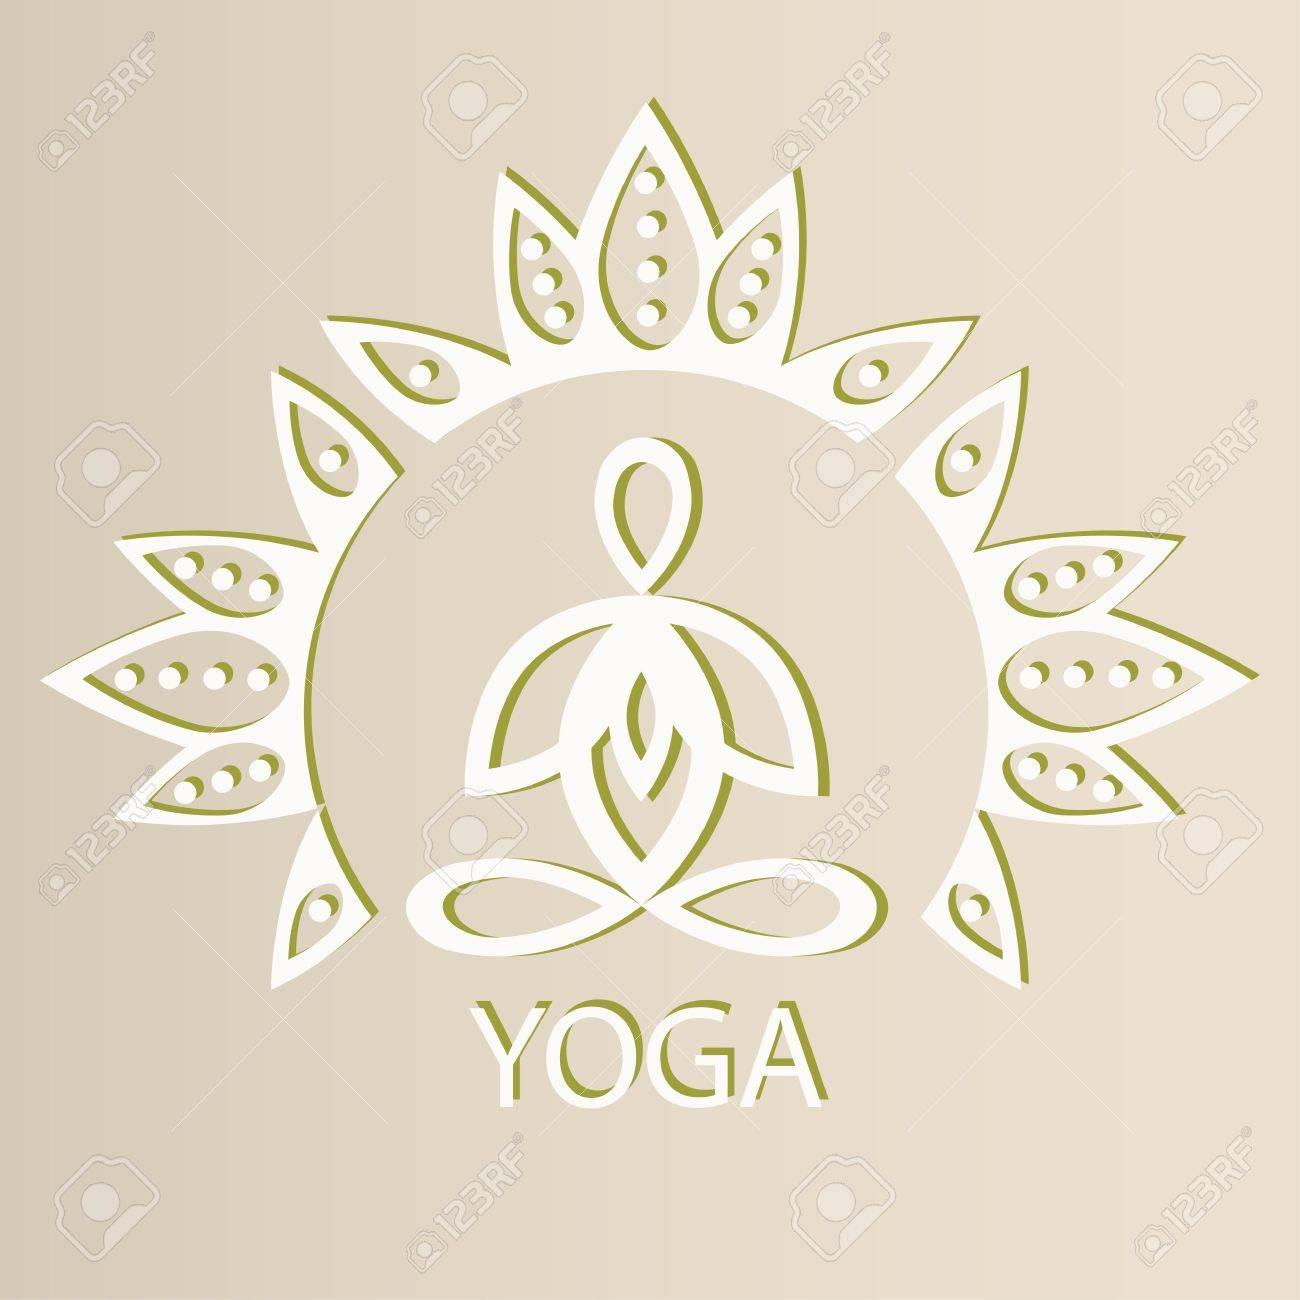 Emblem Yoga Pose On A Lotus Flower Background Design Silhouette